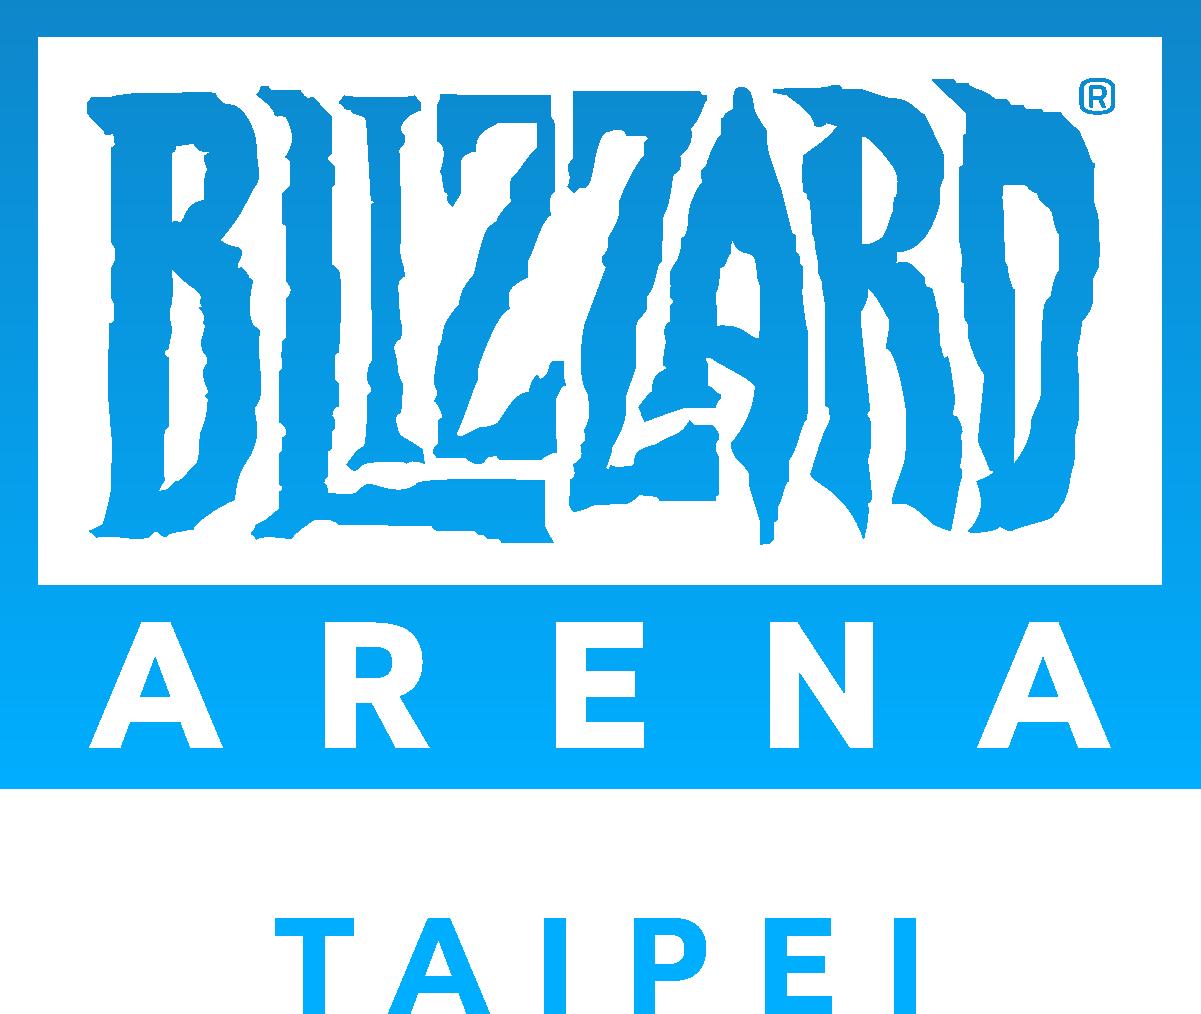 Blizz_Arena_Taipei_Logo_RGB_v2_DarkBkgd.png